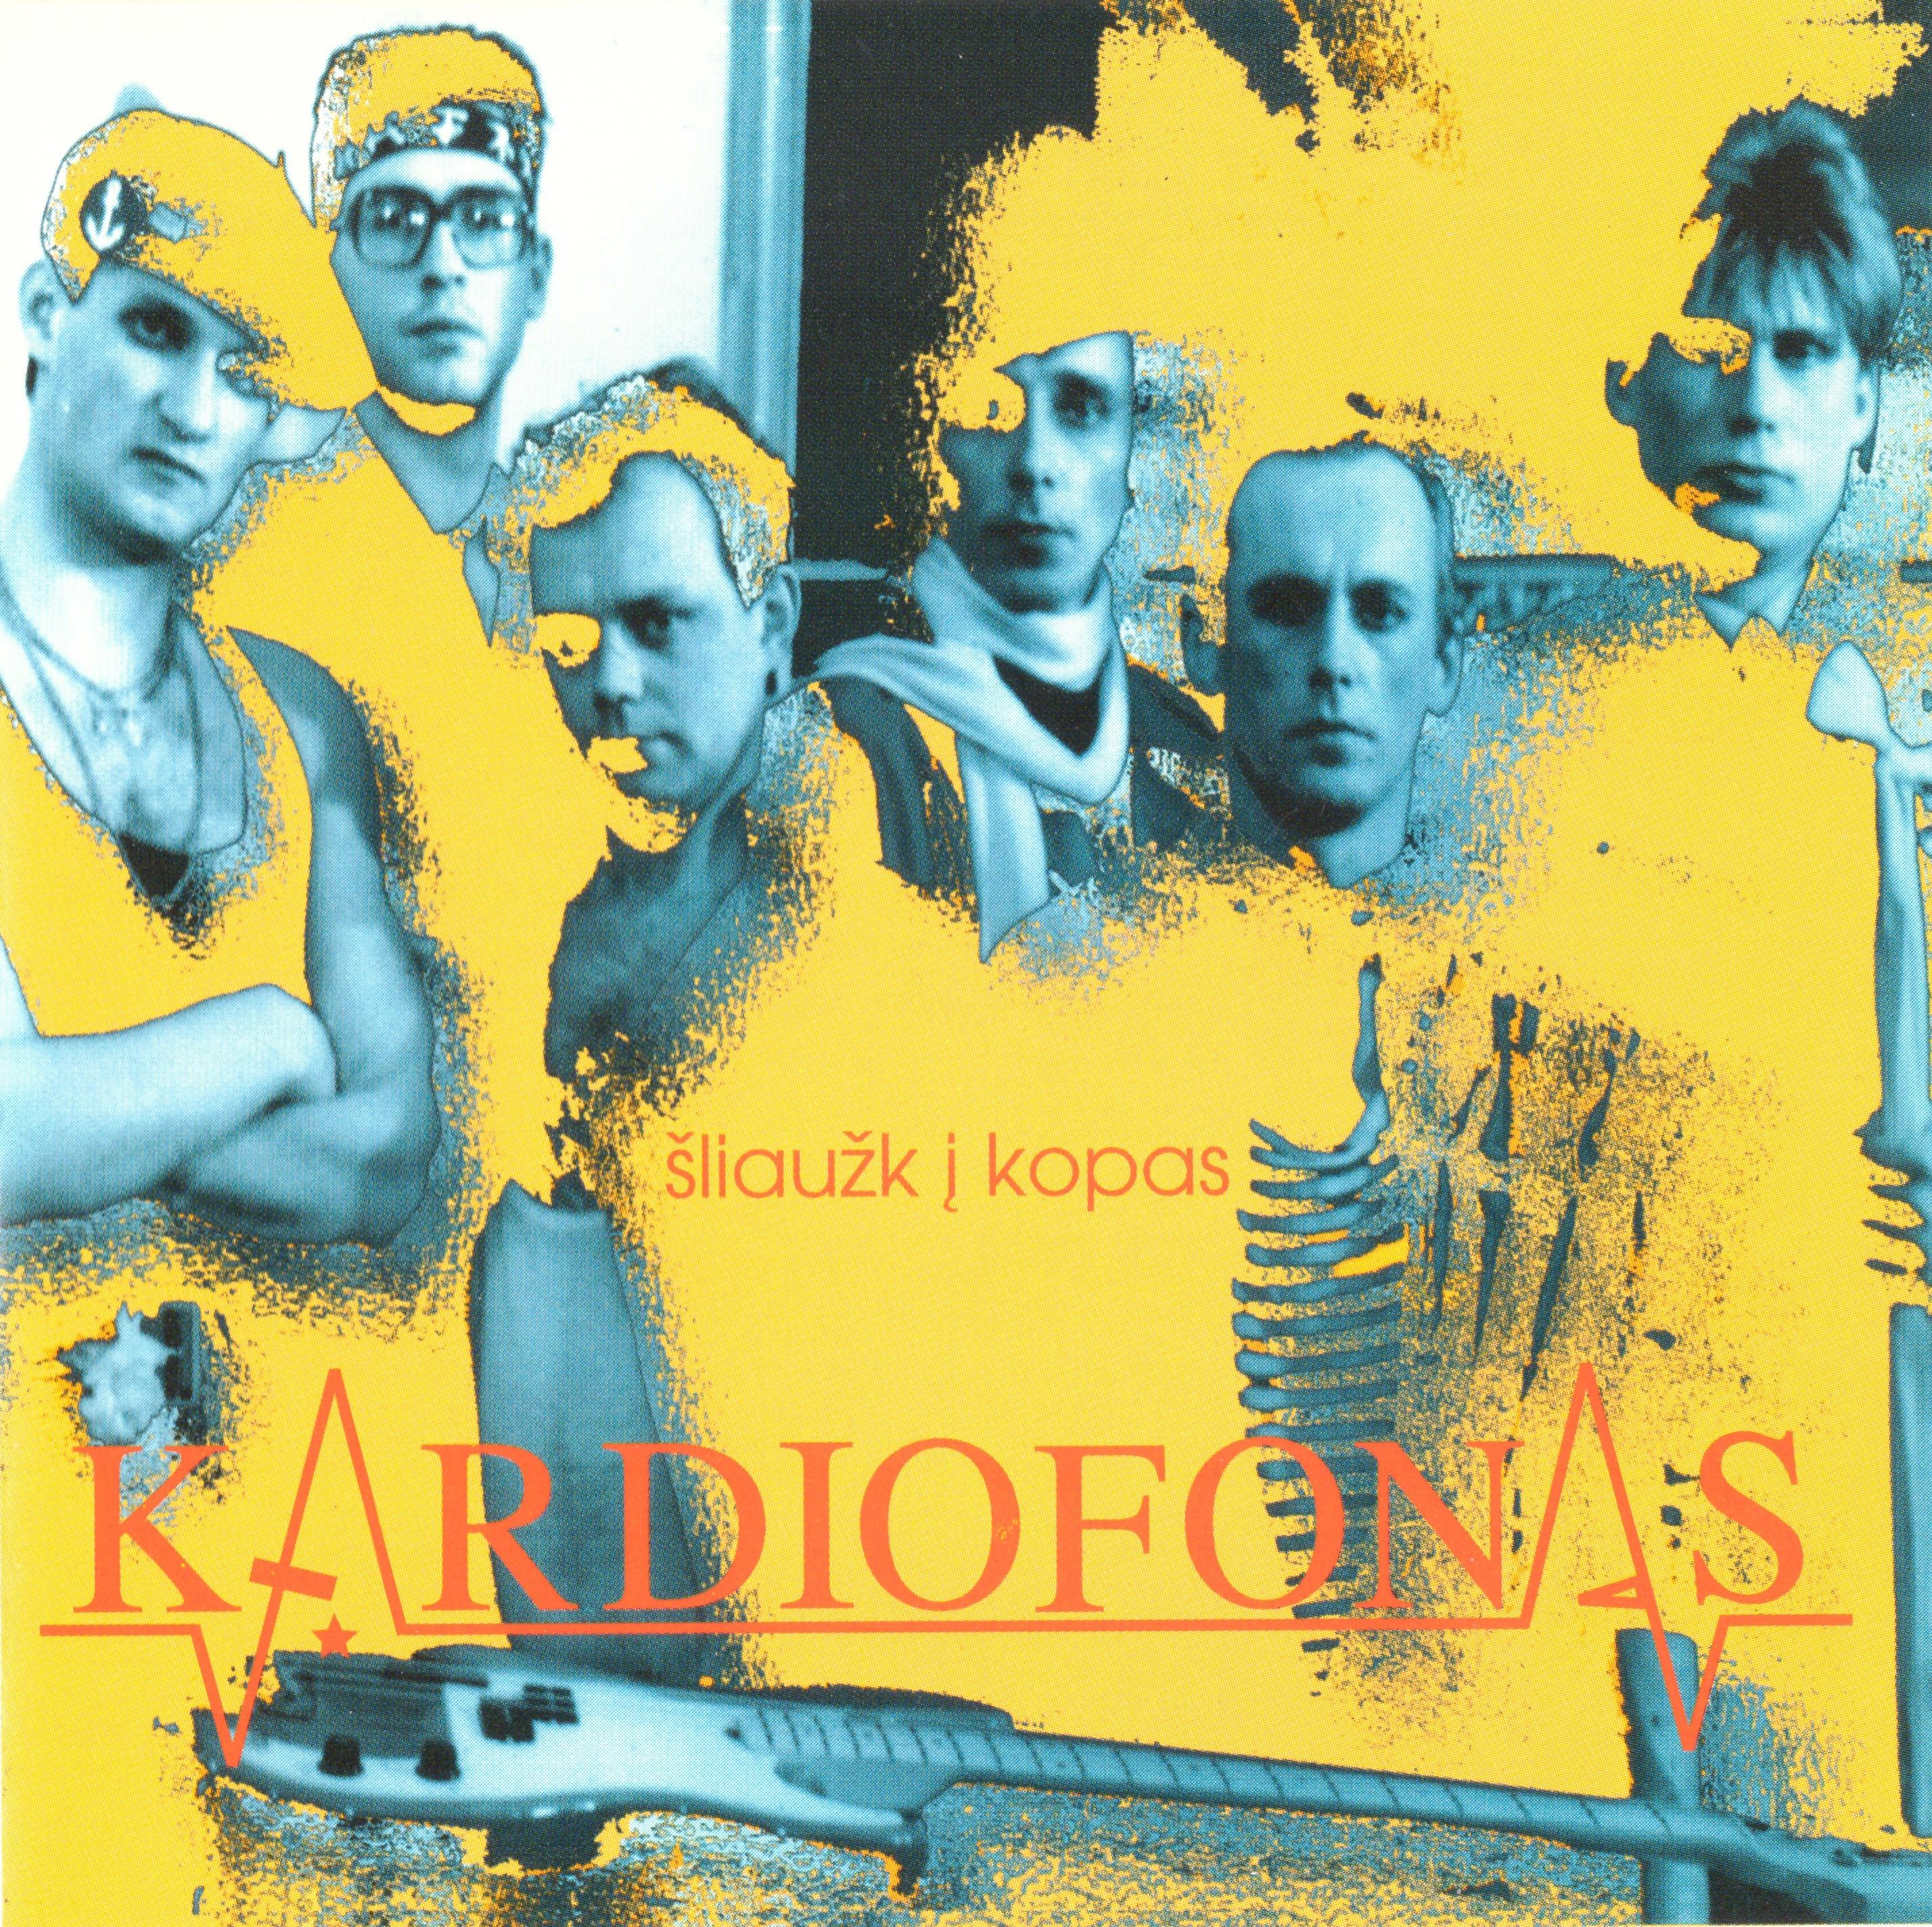 kardiofonas-cd